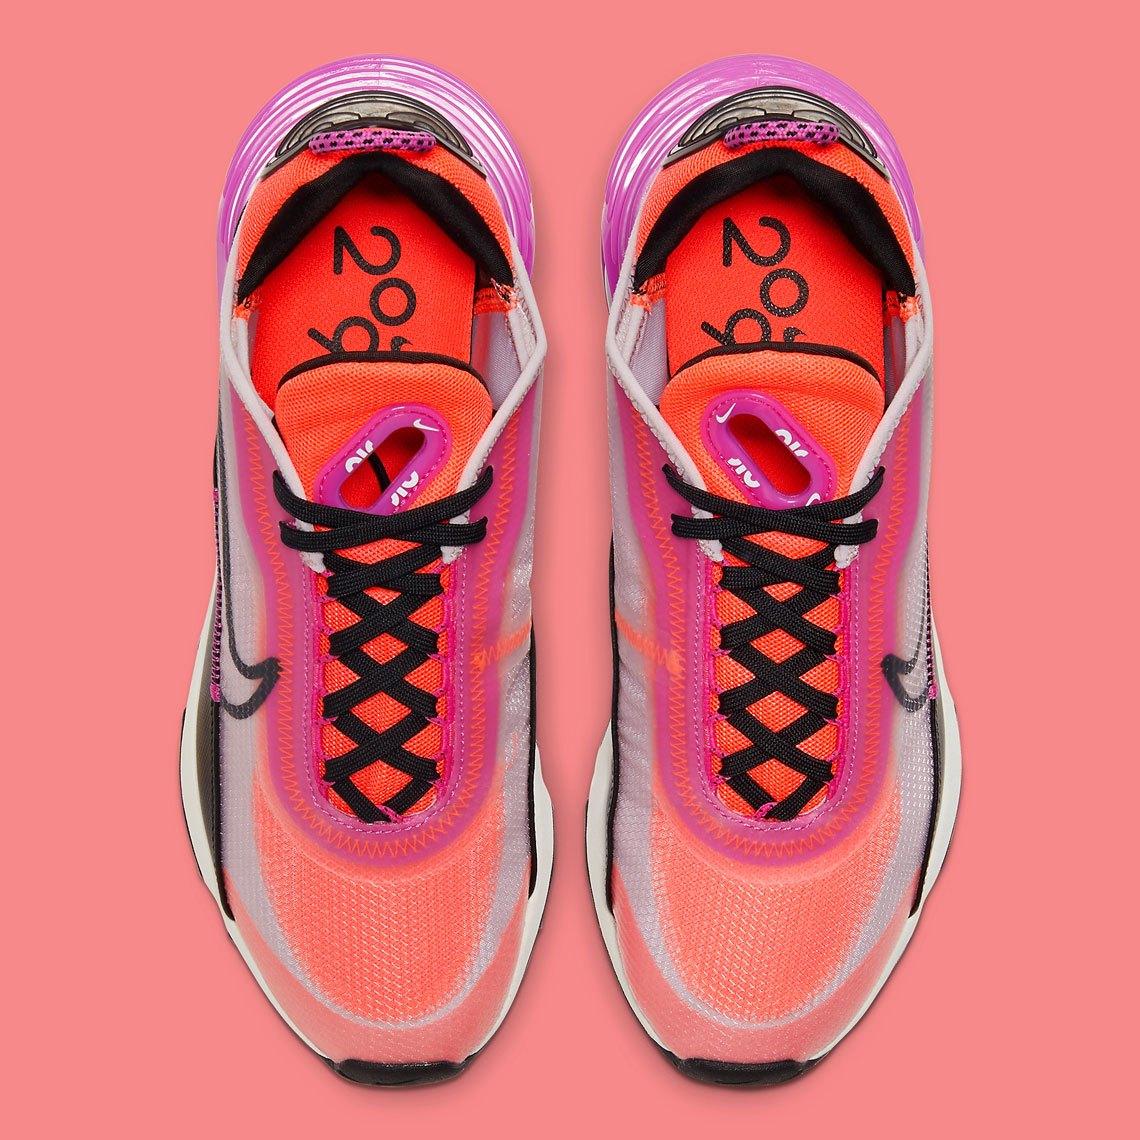 Nike,.Air Max 2090,CK2612-500  落日晚霞配色!Nike Air Max 2090 新品即將發售!